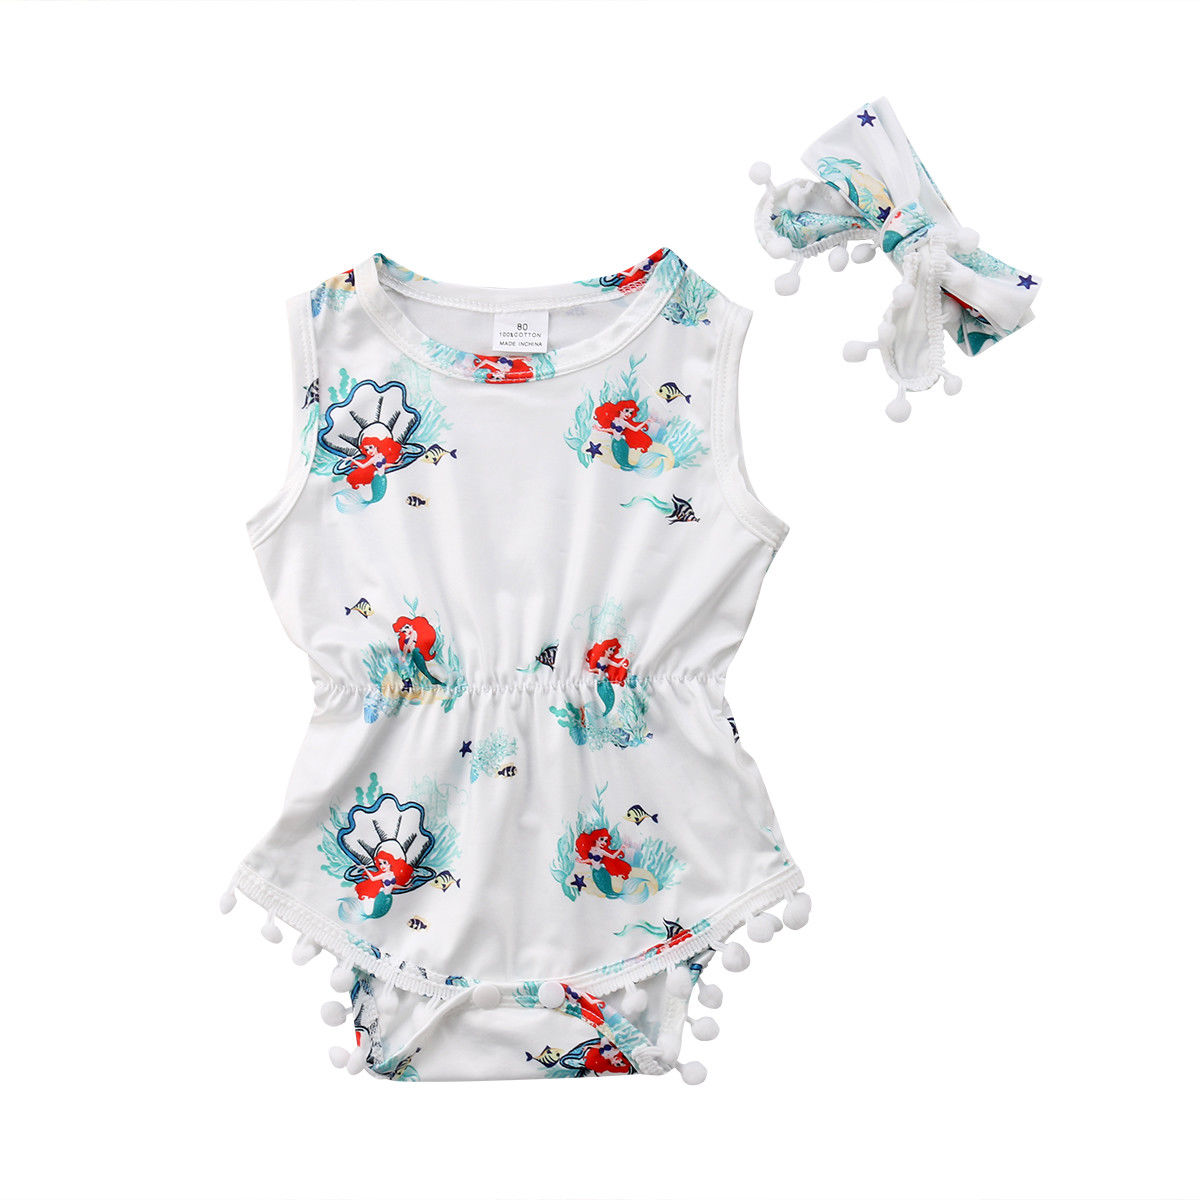 Mermaid Mom Baby Boys Girls Jumpsuit Overall Romper Bodysuit Summer Clothes Black 2